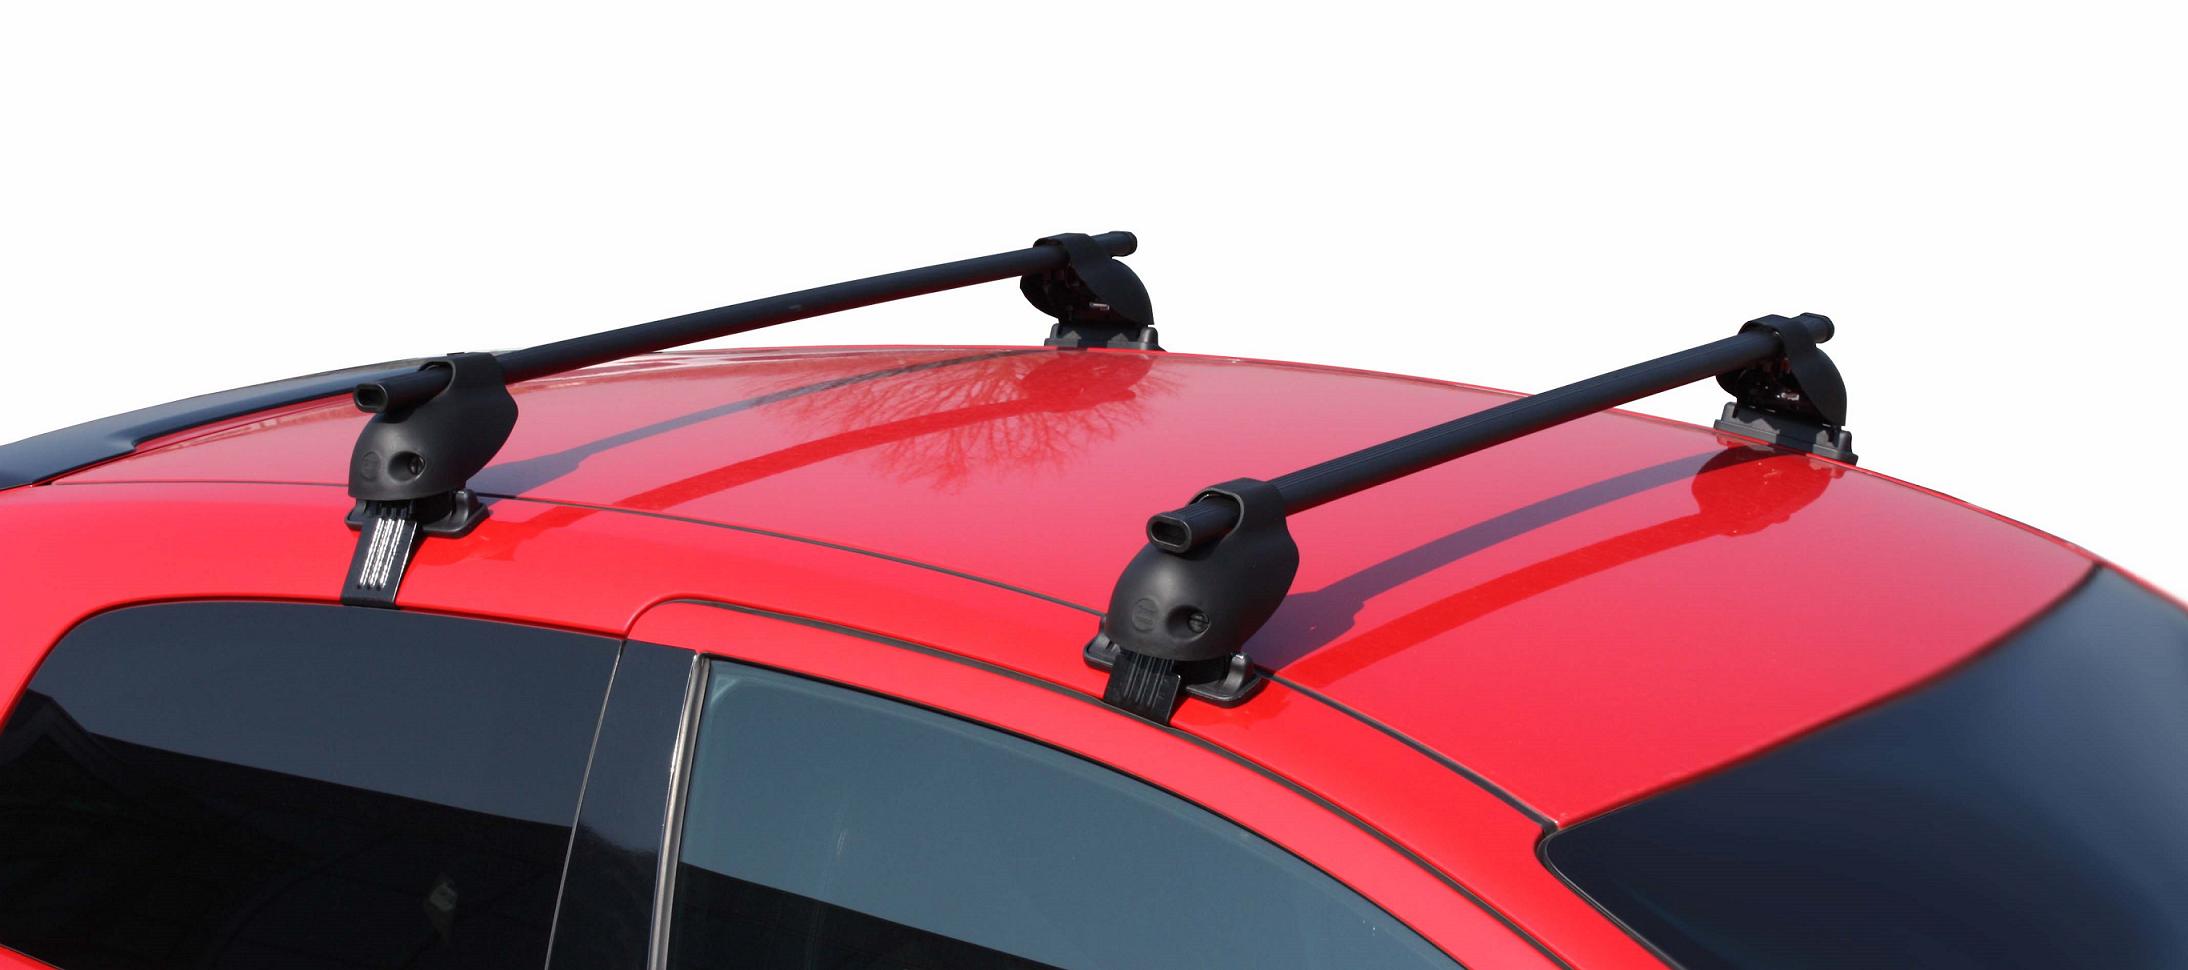 Equip car roof bar load rails carrier for honda citroen skoda hyundai toyota vw2